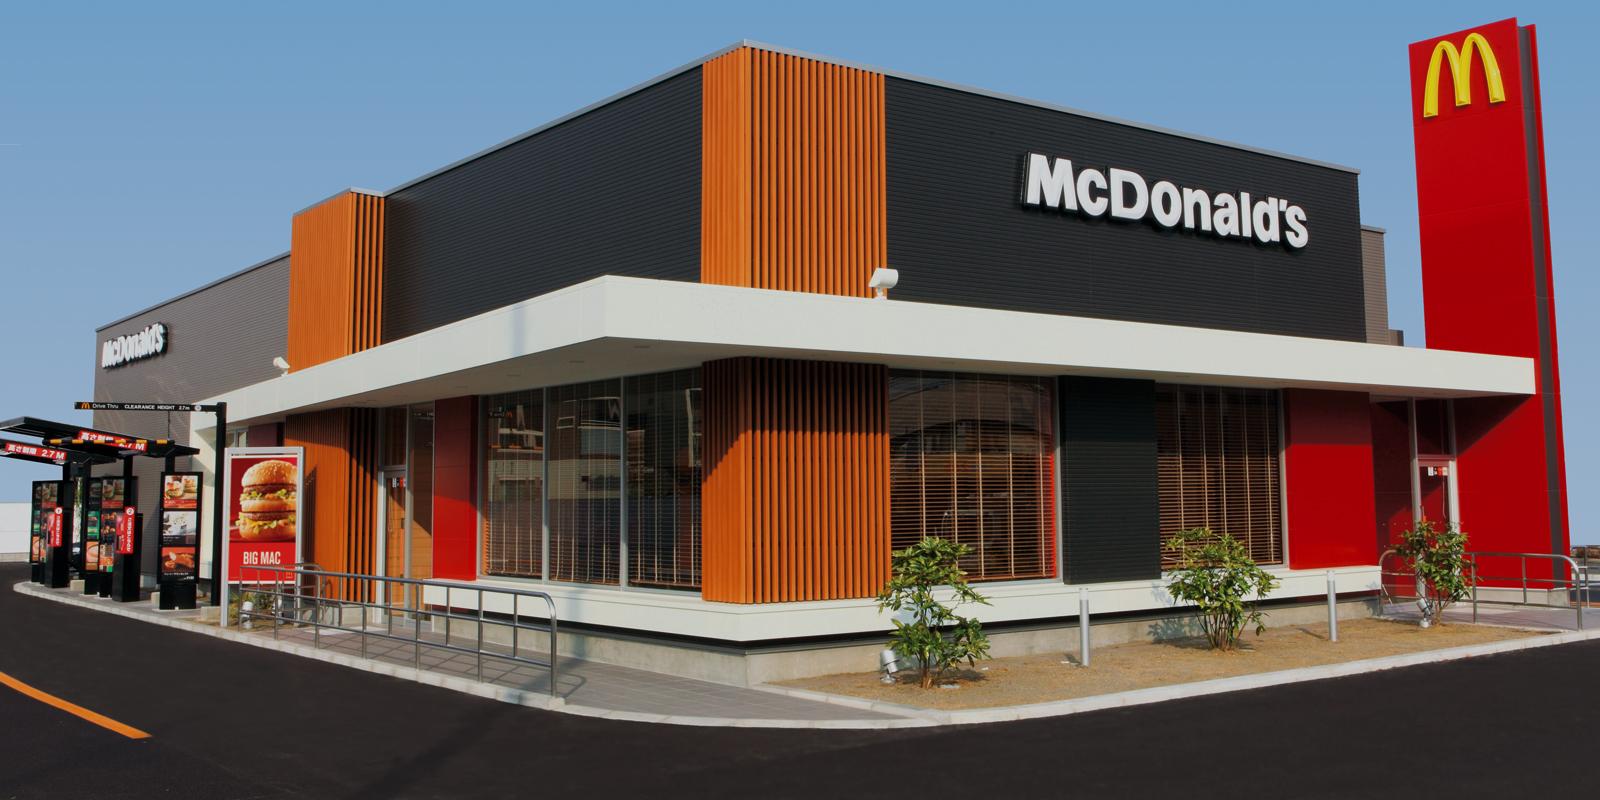 https://www.mcdonalds.co.jp/company/content/dam/web/mcdonalds/company/fc/images/main07.jpg